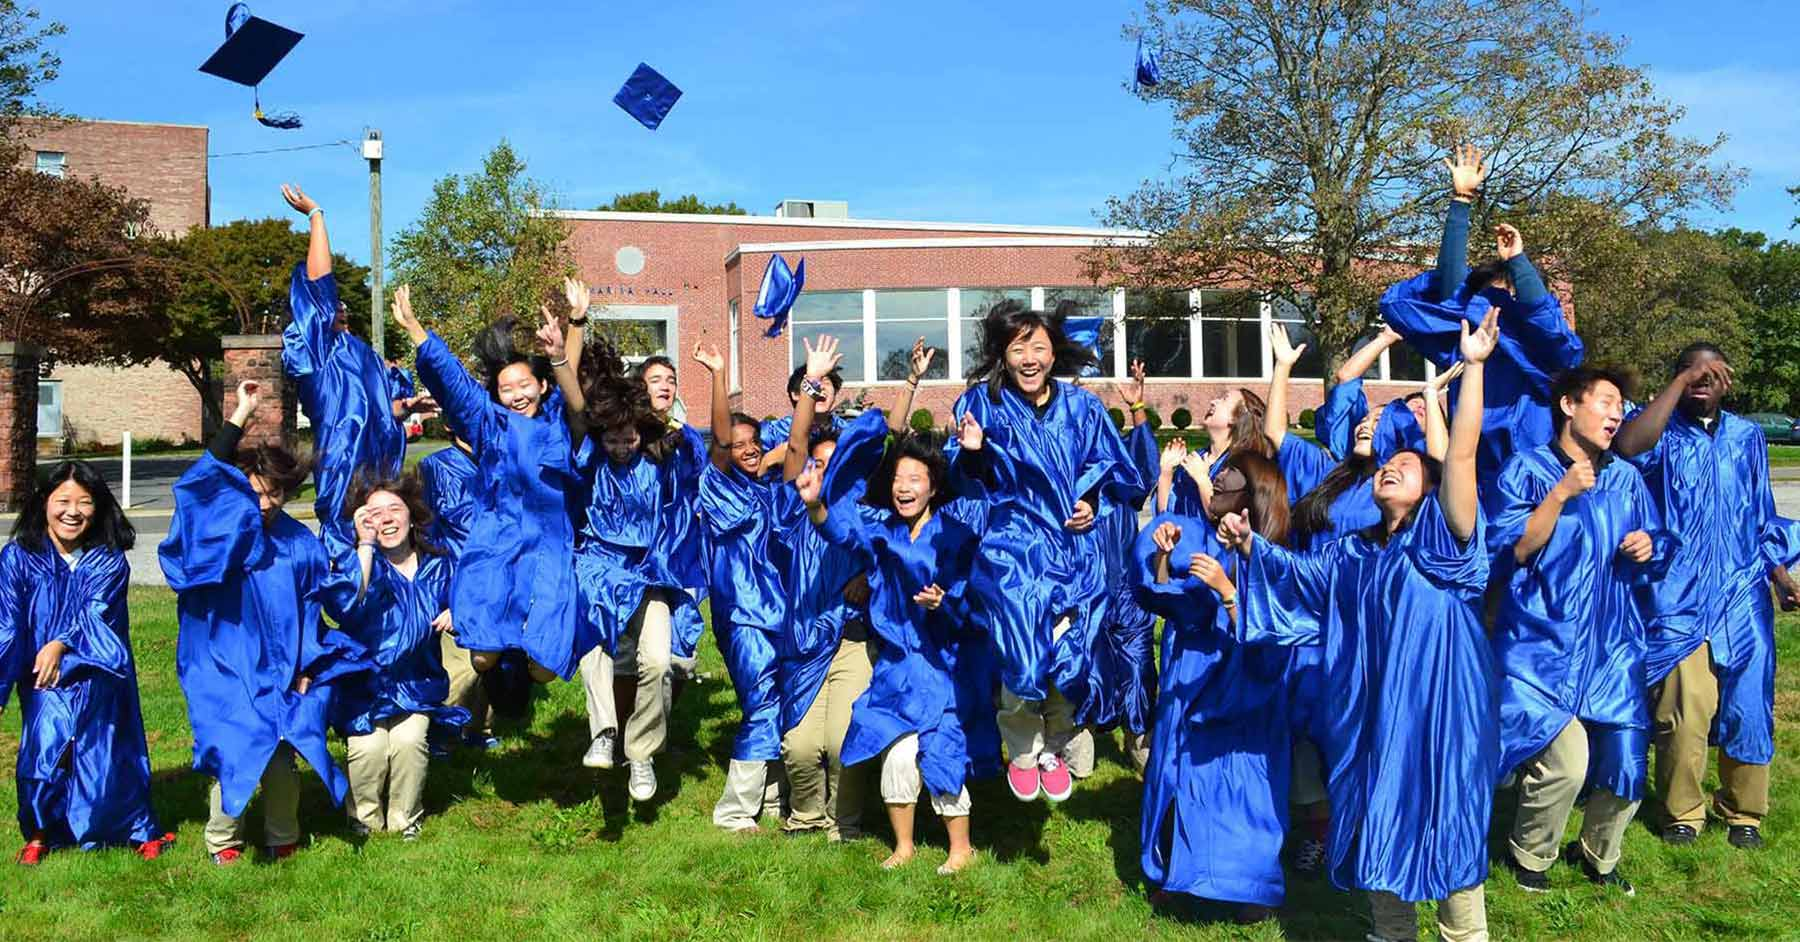 Bridgeport International Academy in Bridgeport, CT - Niche